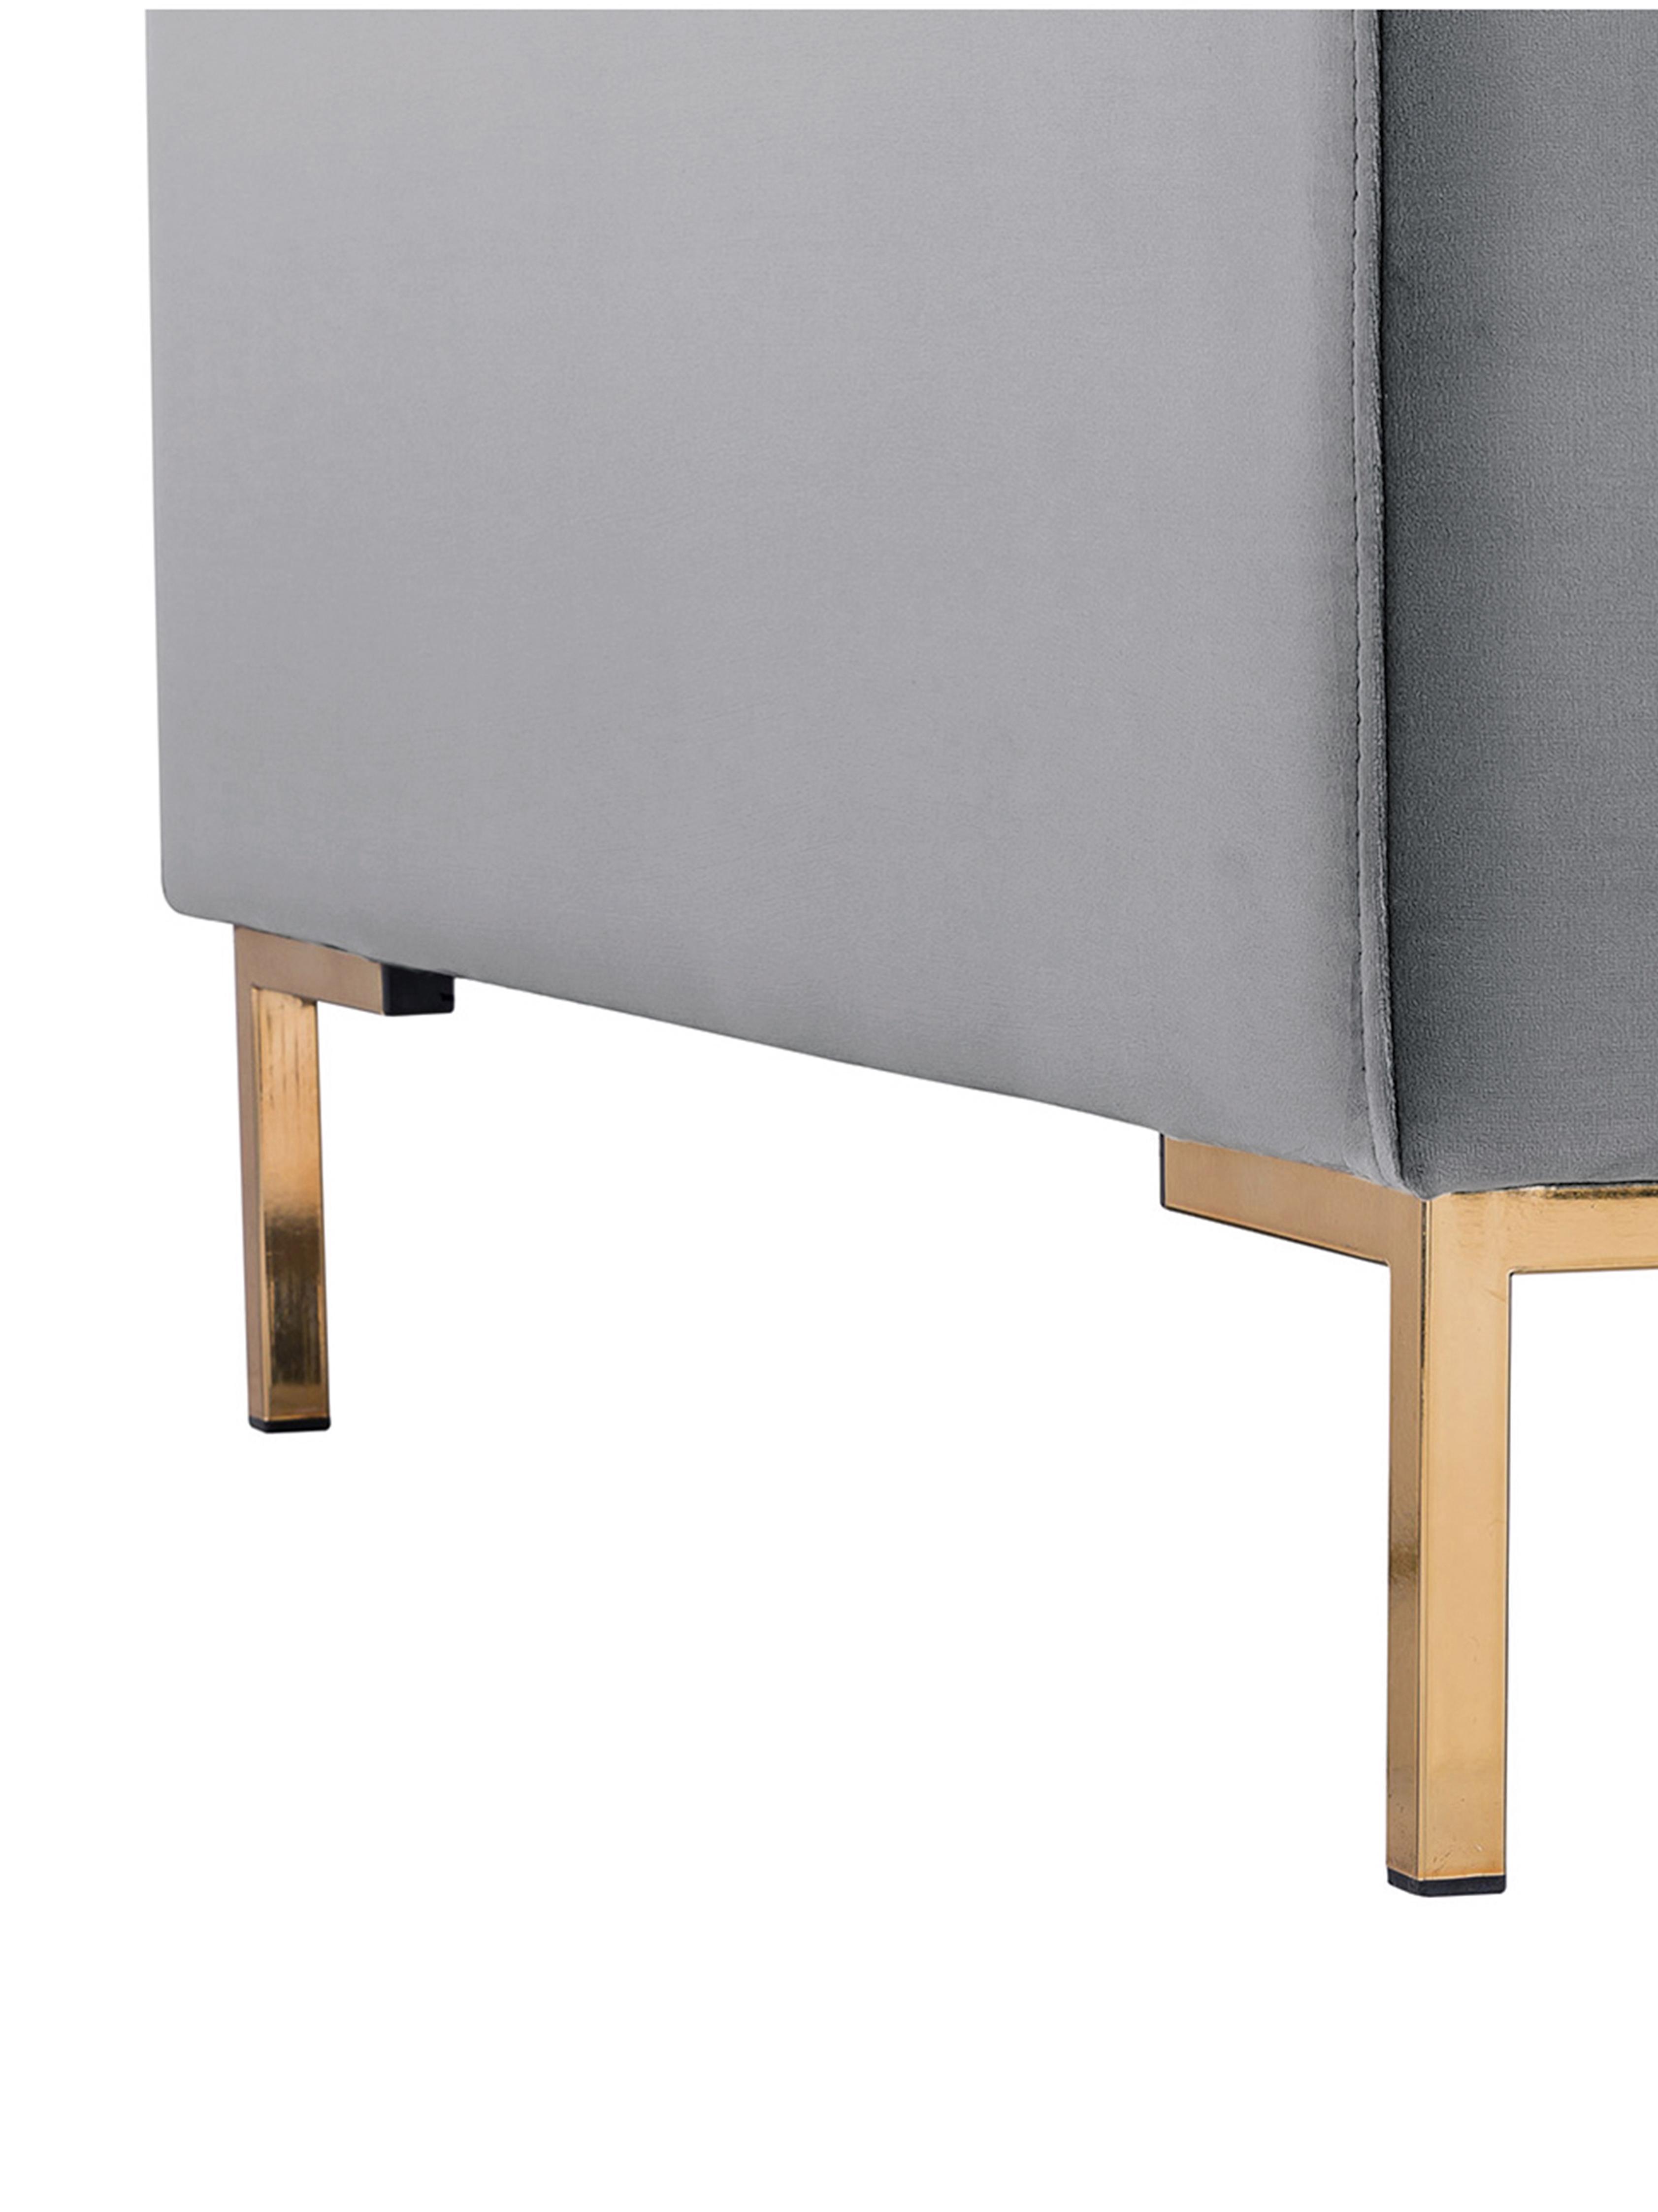 Samt-Sofa Luna (3-Sitzer), Bezug: Samt (Polyester) Der hoch, Gestell: Massives Buchenholz, Füße: Metall, galvanisiert, Samt Hellgrau, Gold, B 230 x T 95 cm